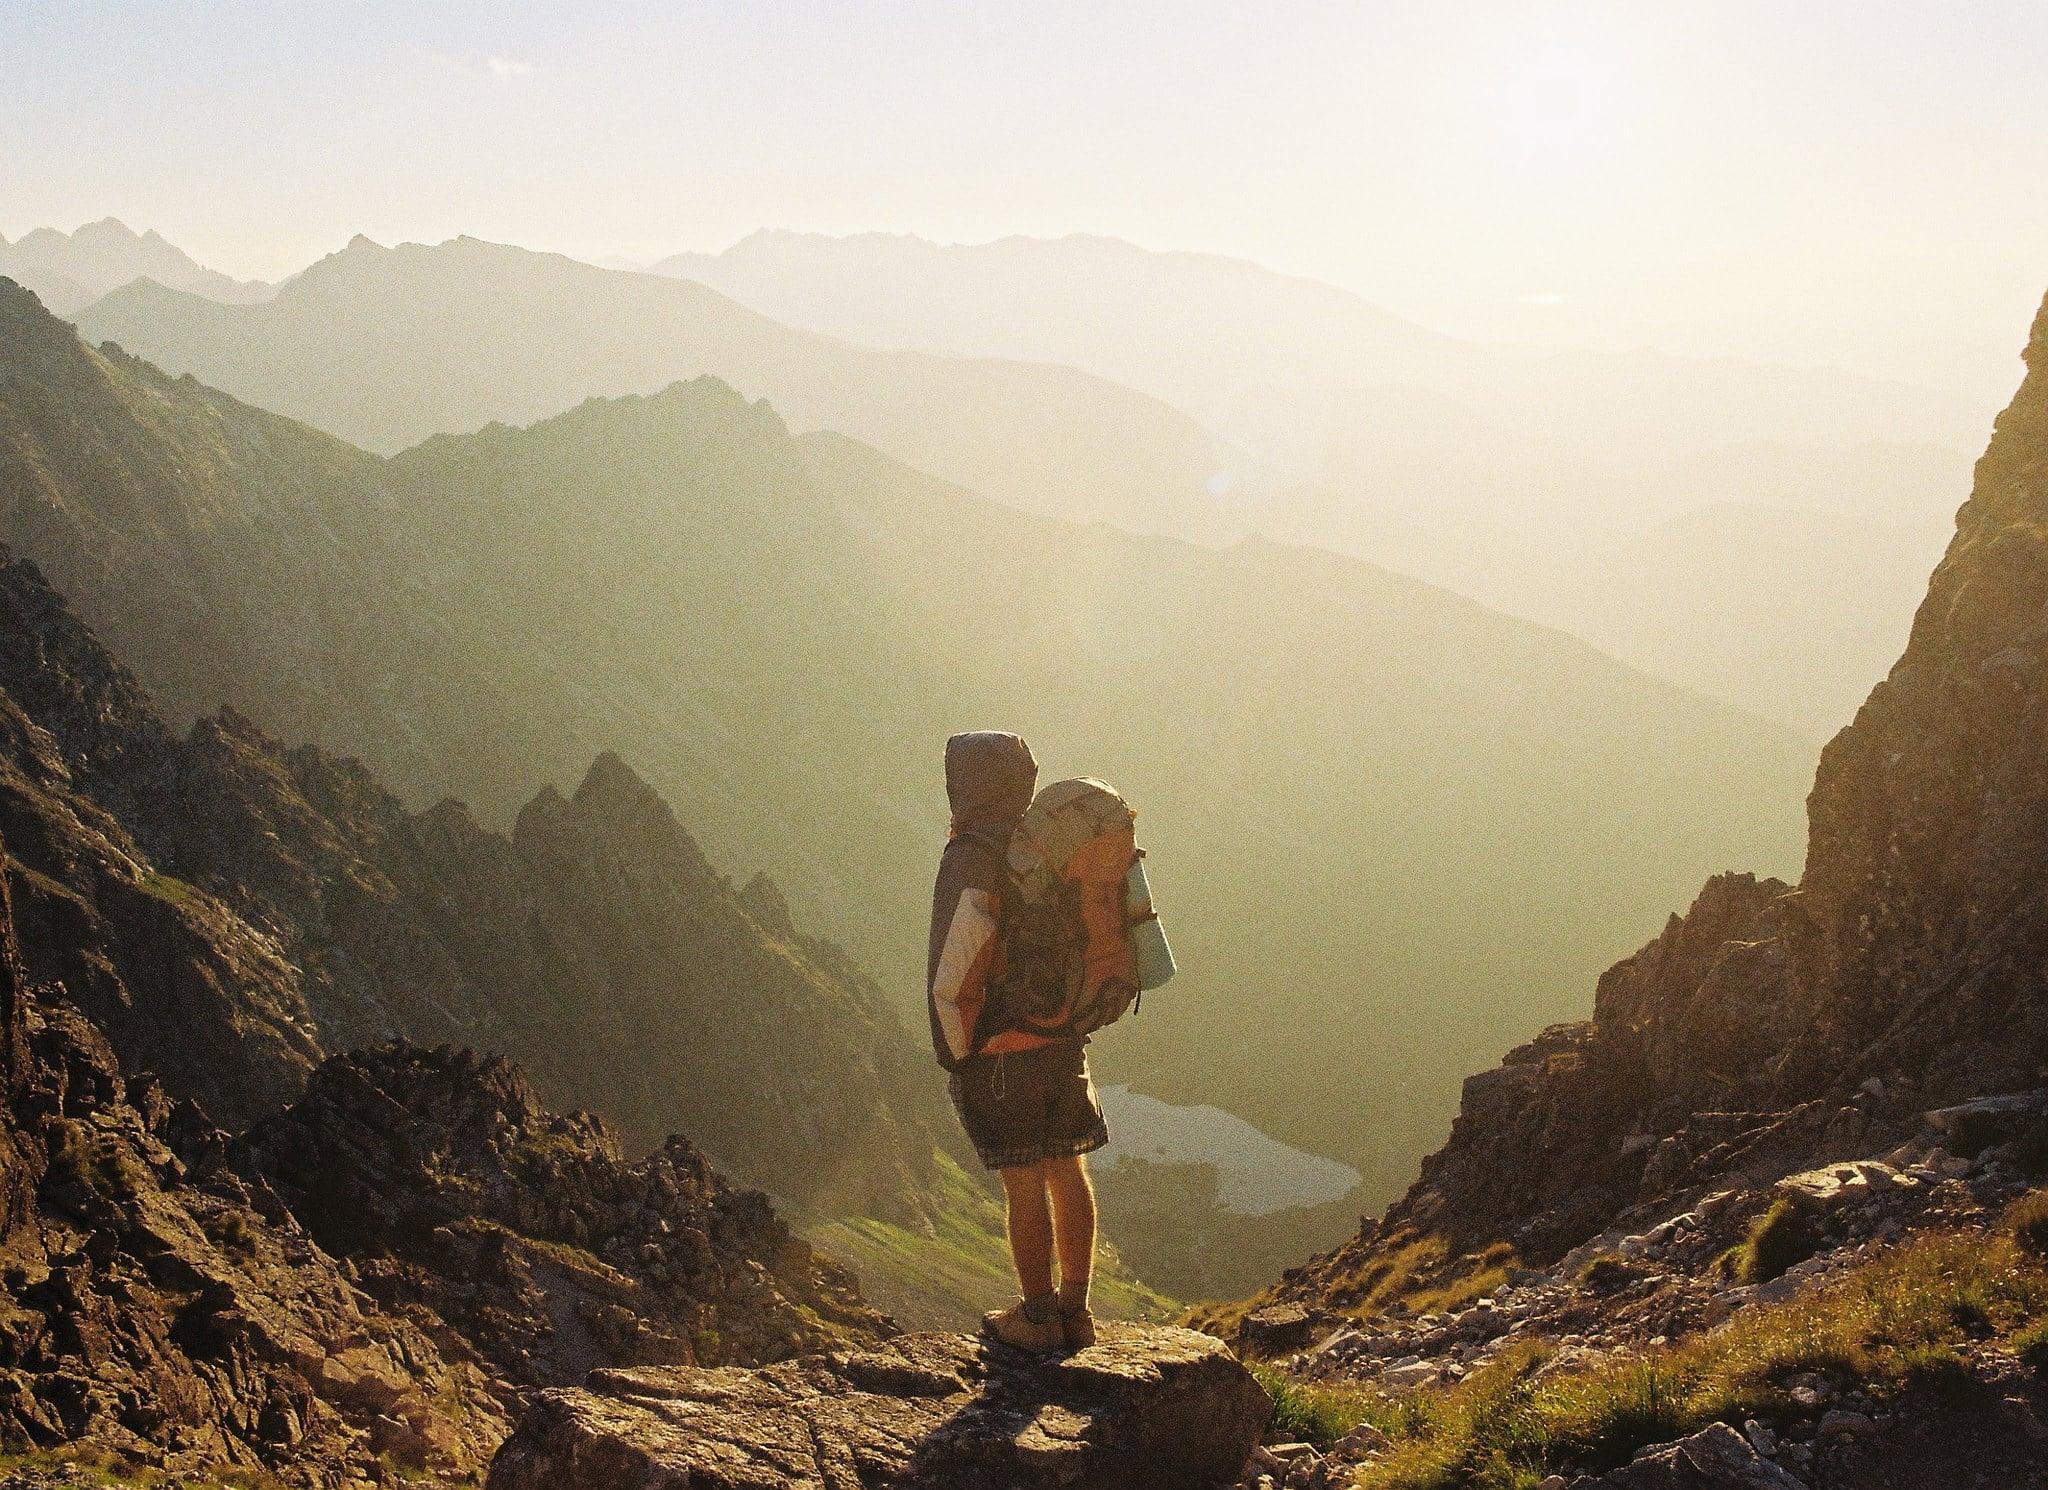 Backpacker-Hiking-Mountains-Sunrise